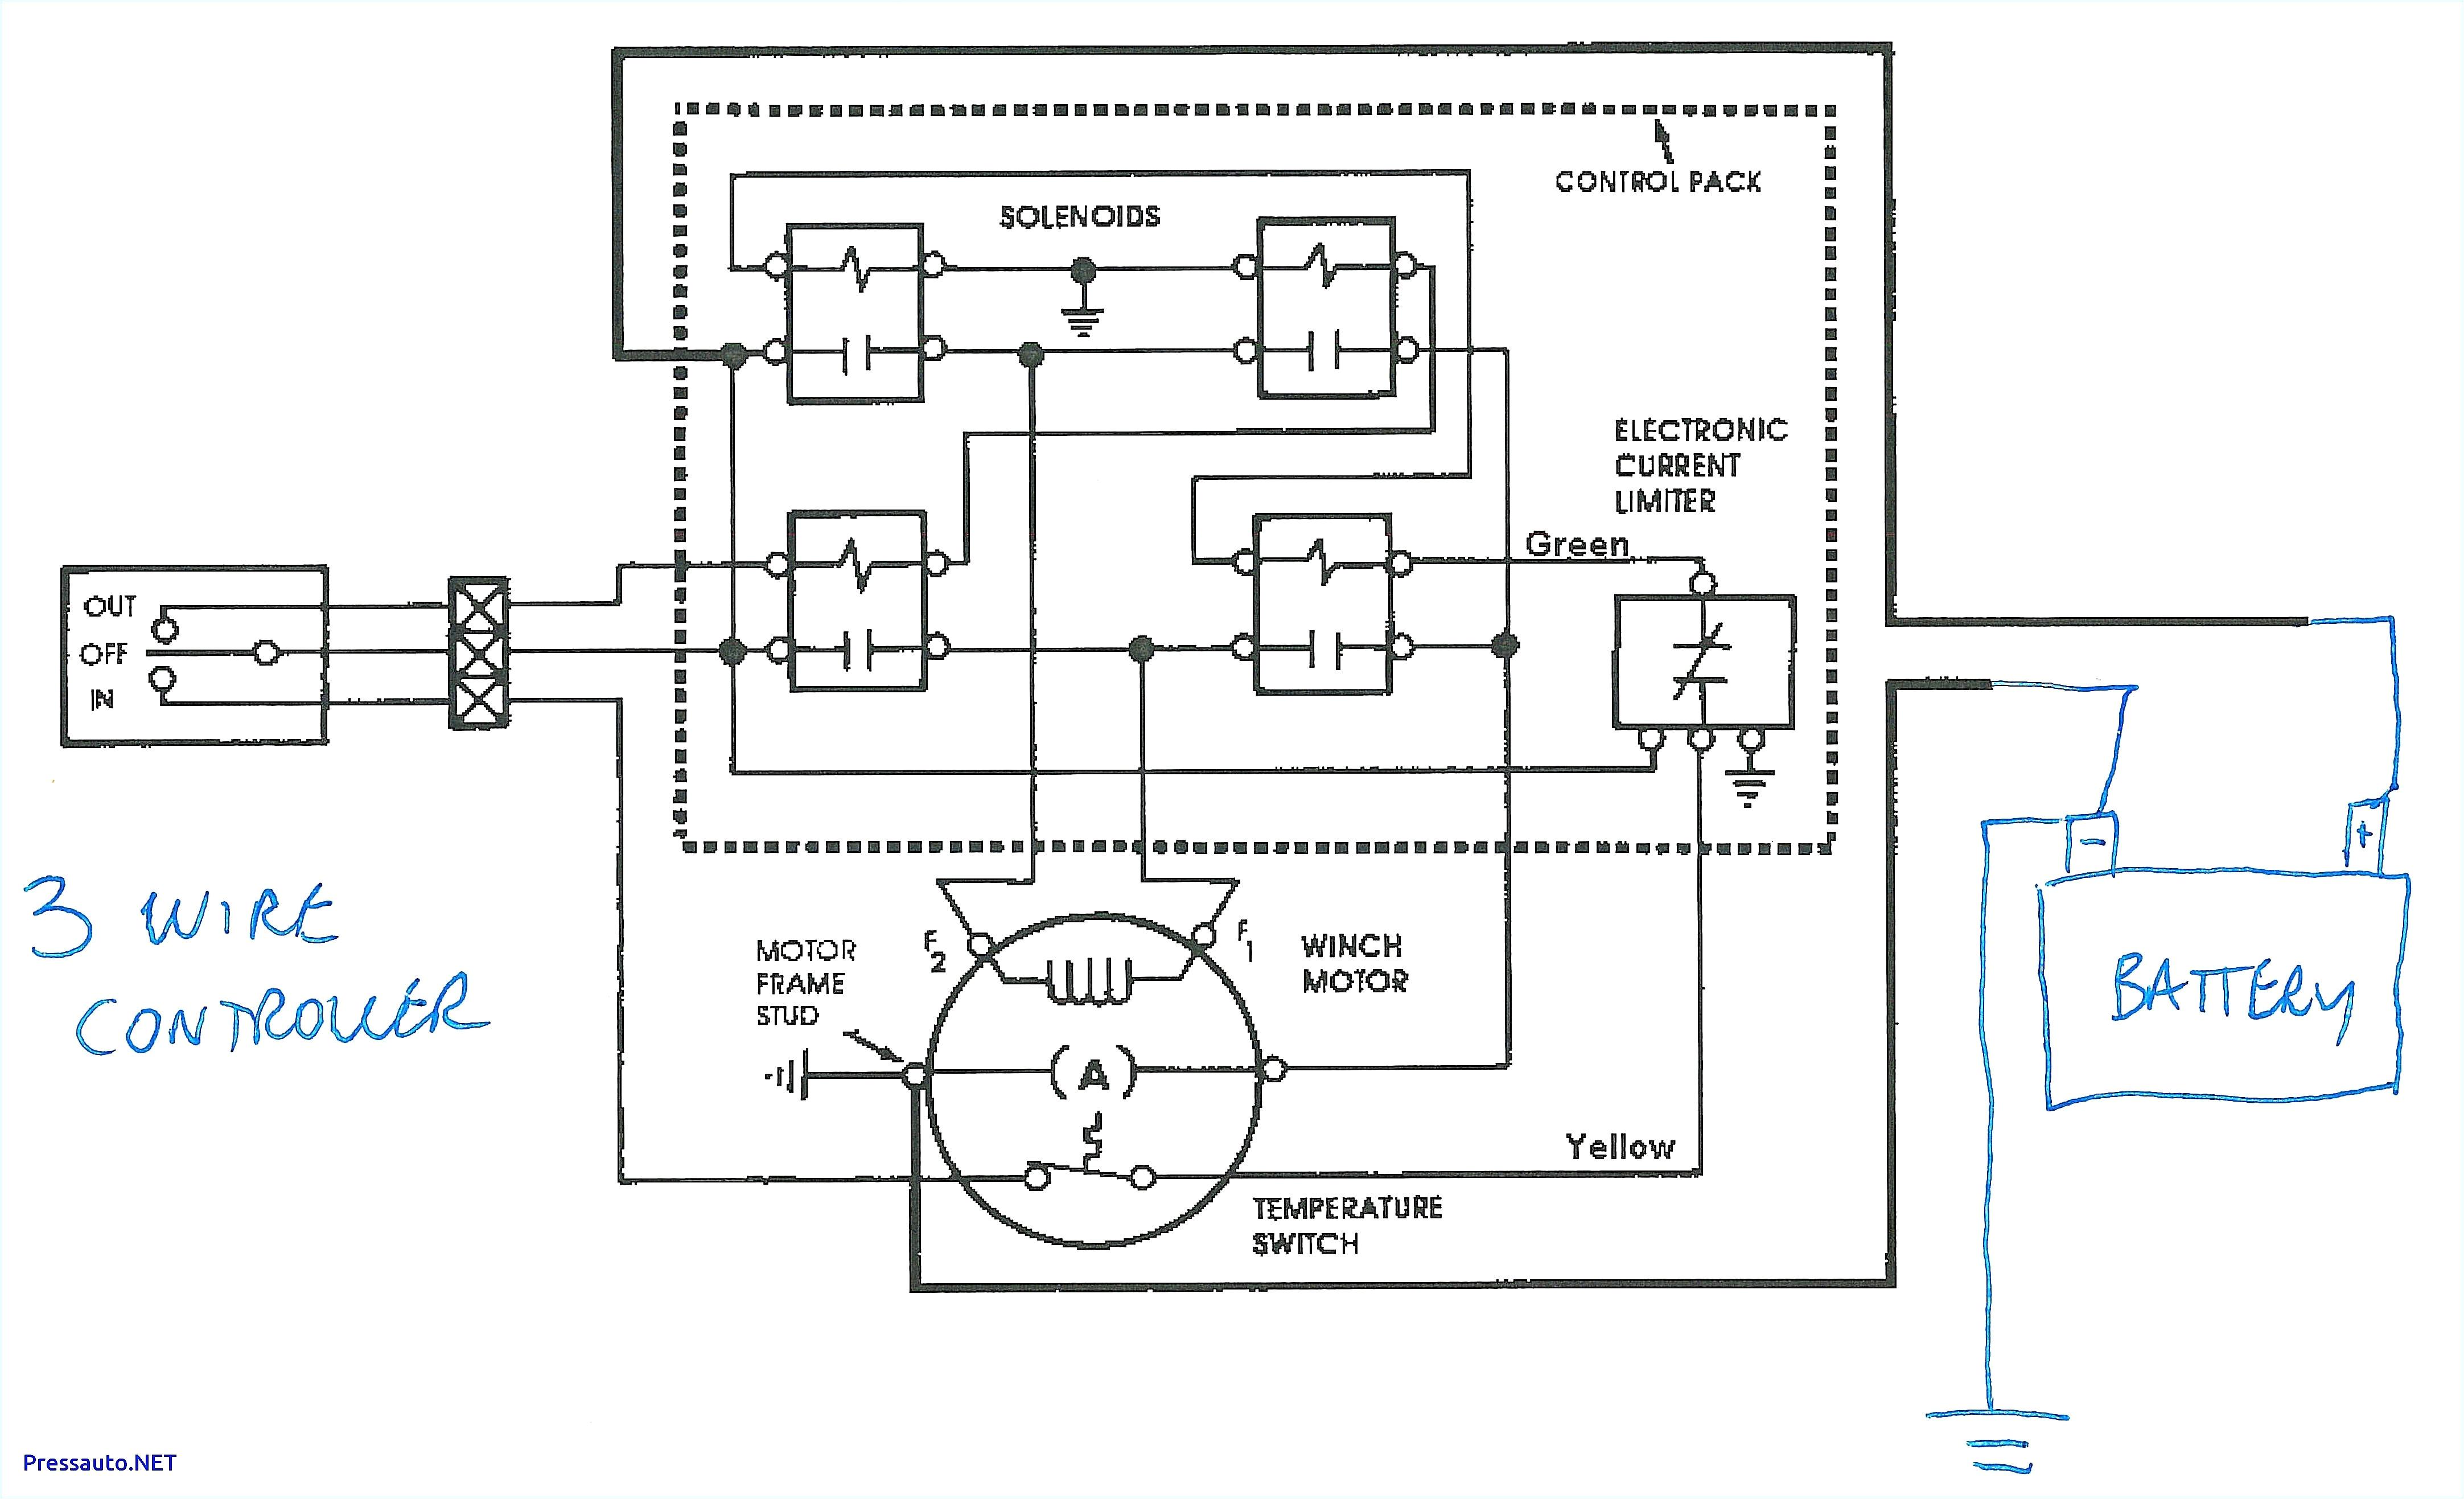 warn winch wiring diagram 75000 wiring diagram sys warn winch wiring diagram 75000